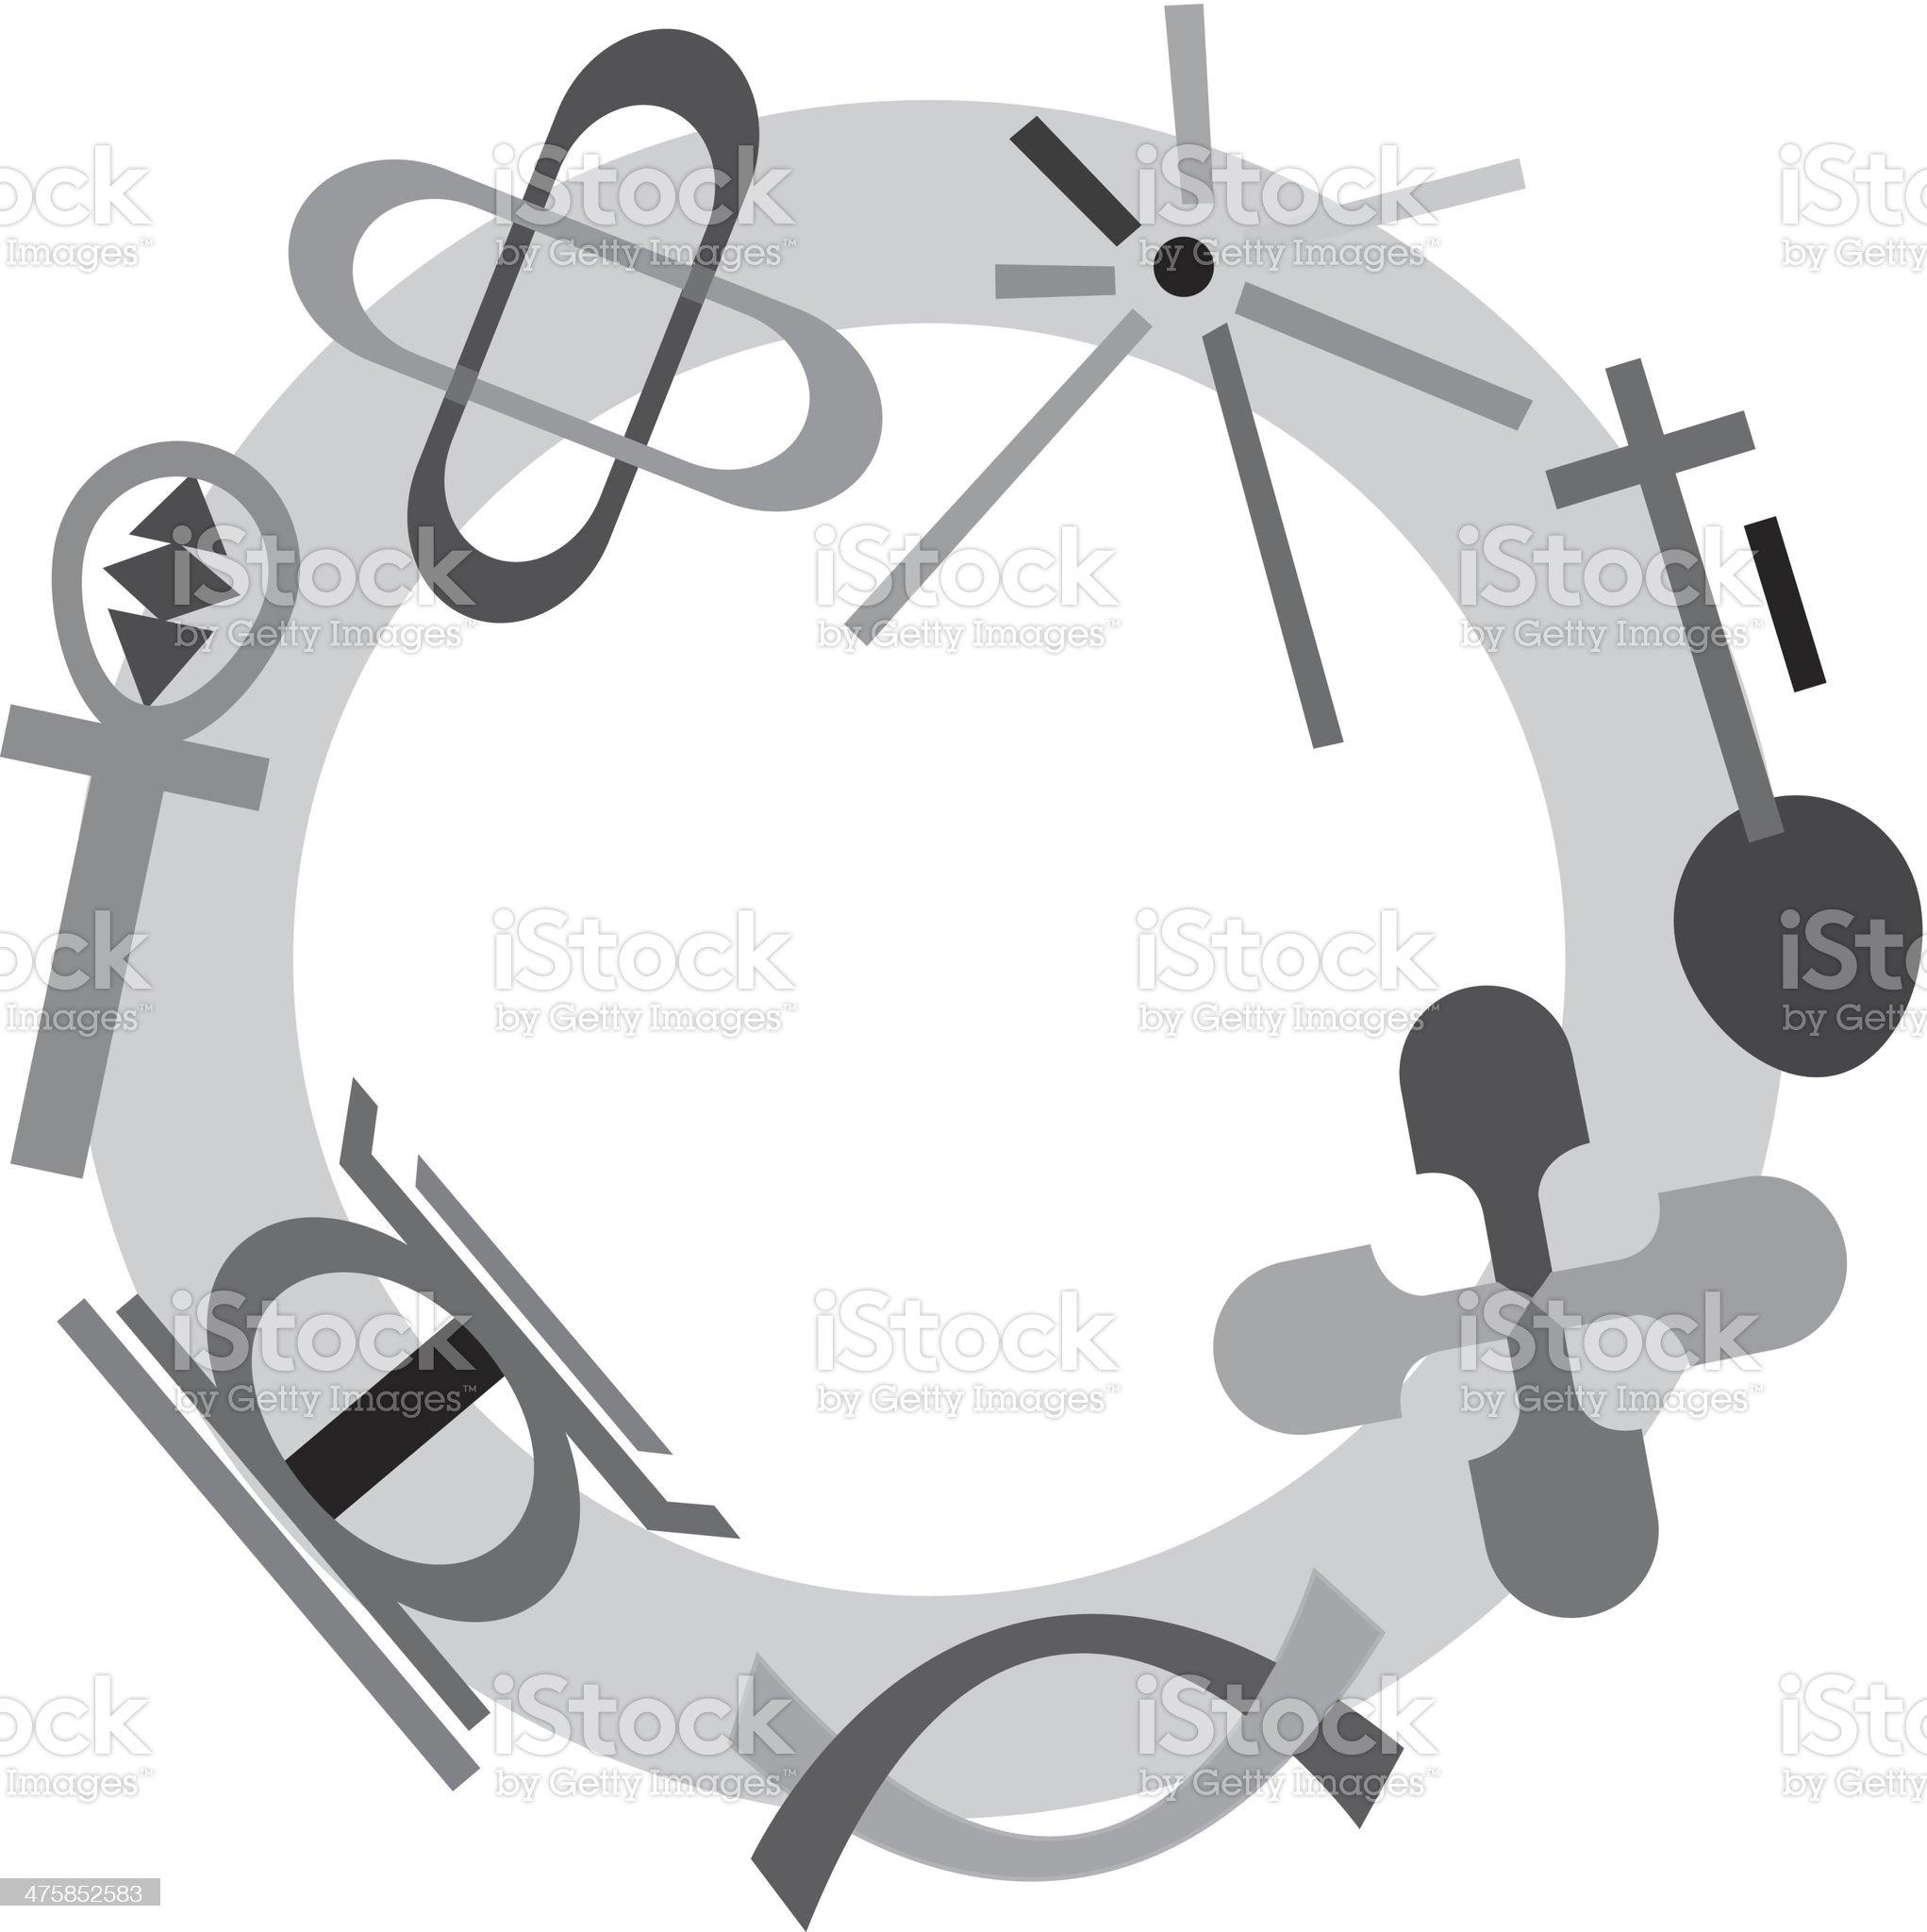 Kwanzaa Symbols royalty-free stock vector art